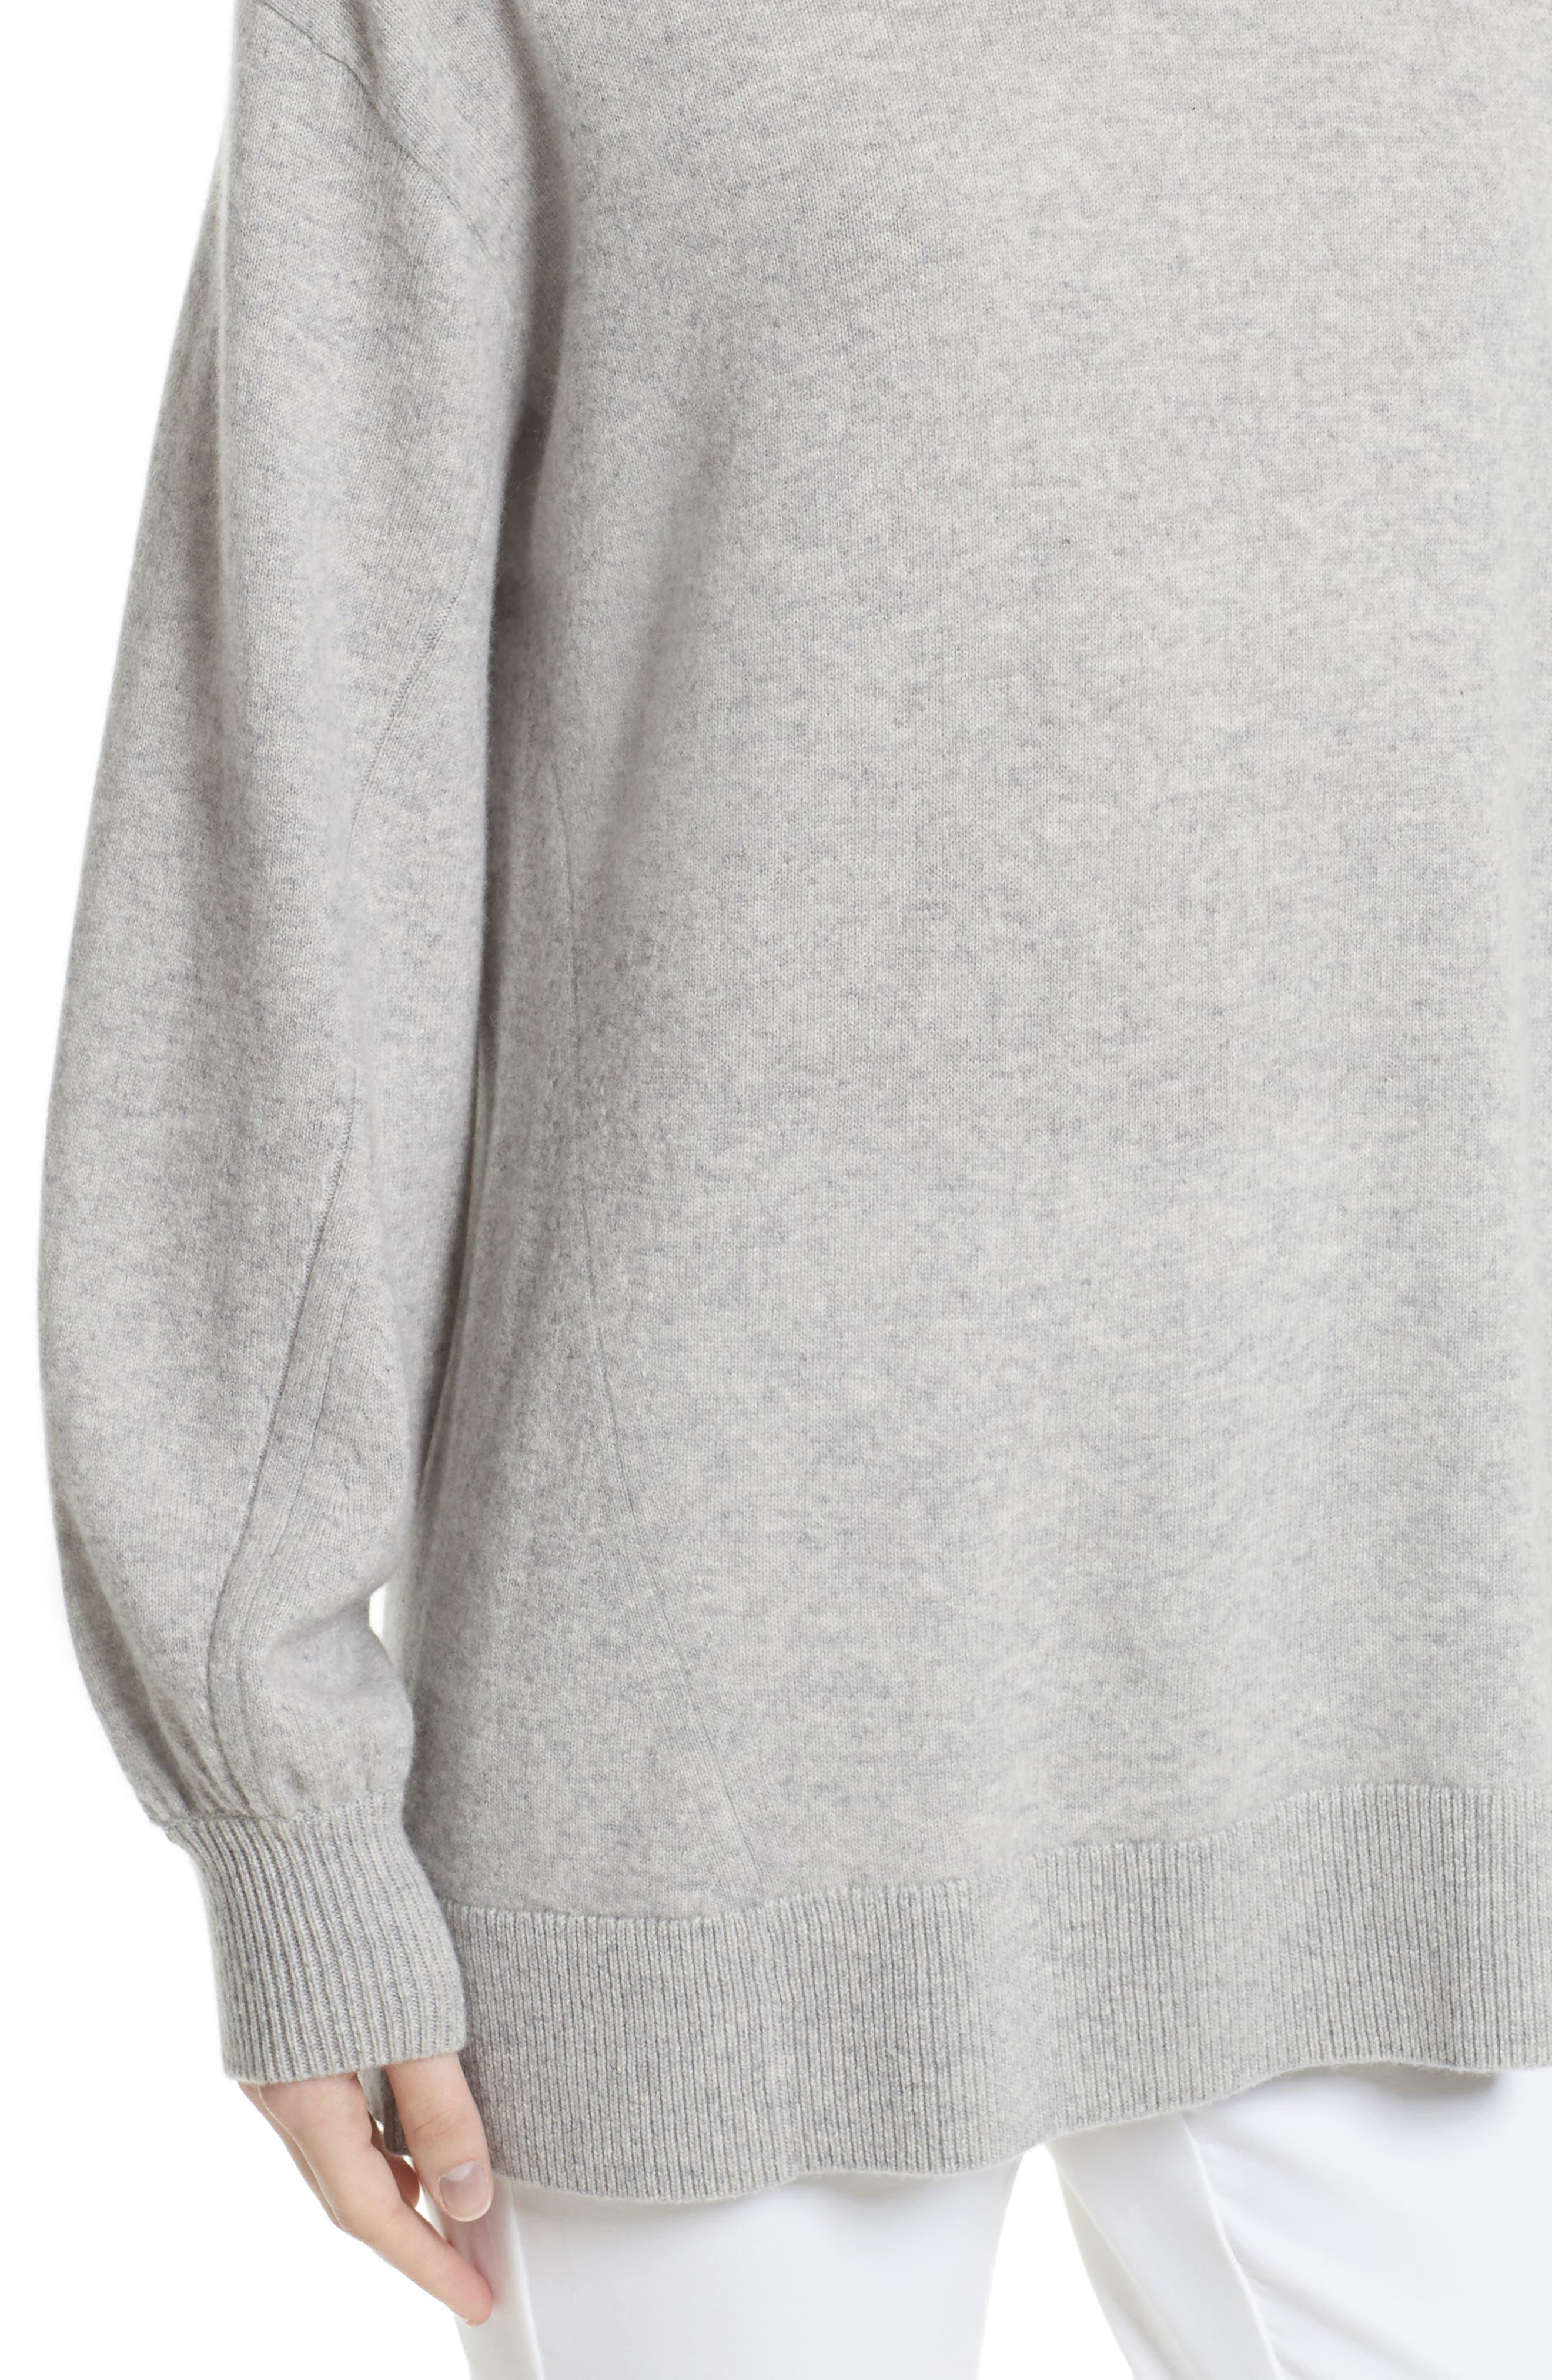 Ace Cashmere Turtleneck Sweater,                             Alternate thumbnail 4, color,                             058